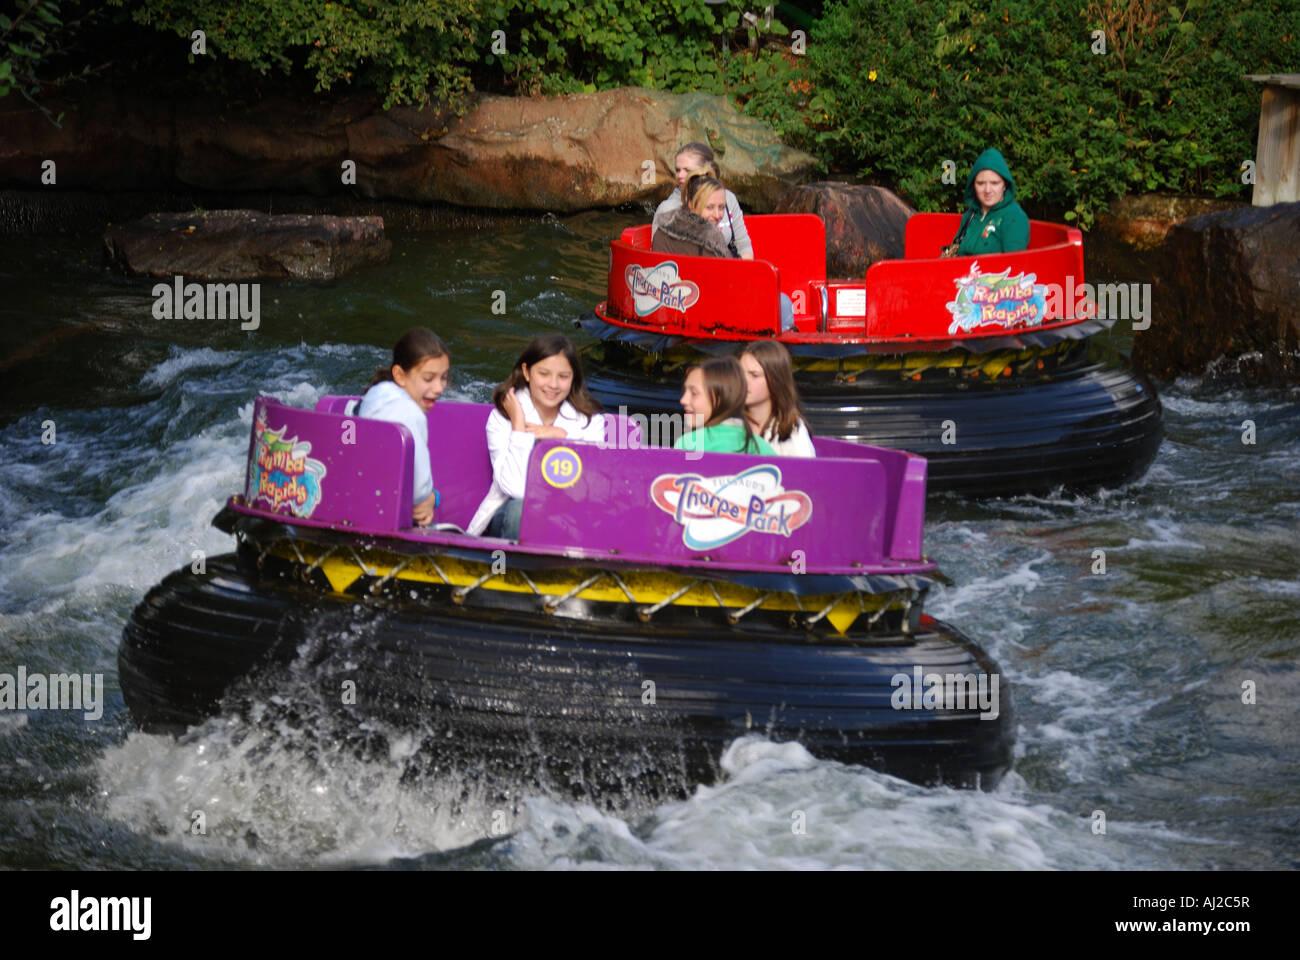 Rumba Rapids Ride, Calypso Quay, Thorpe Park Theme Park, Chertsey, Surrey, UK England - Stock Image